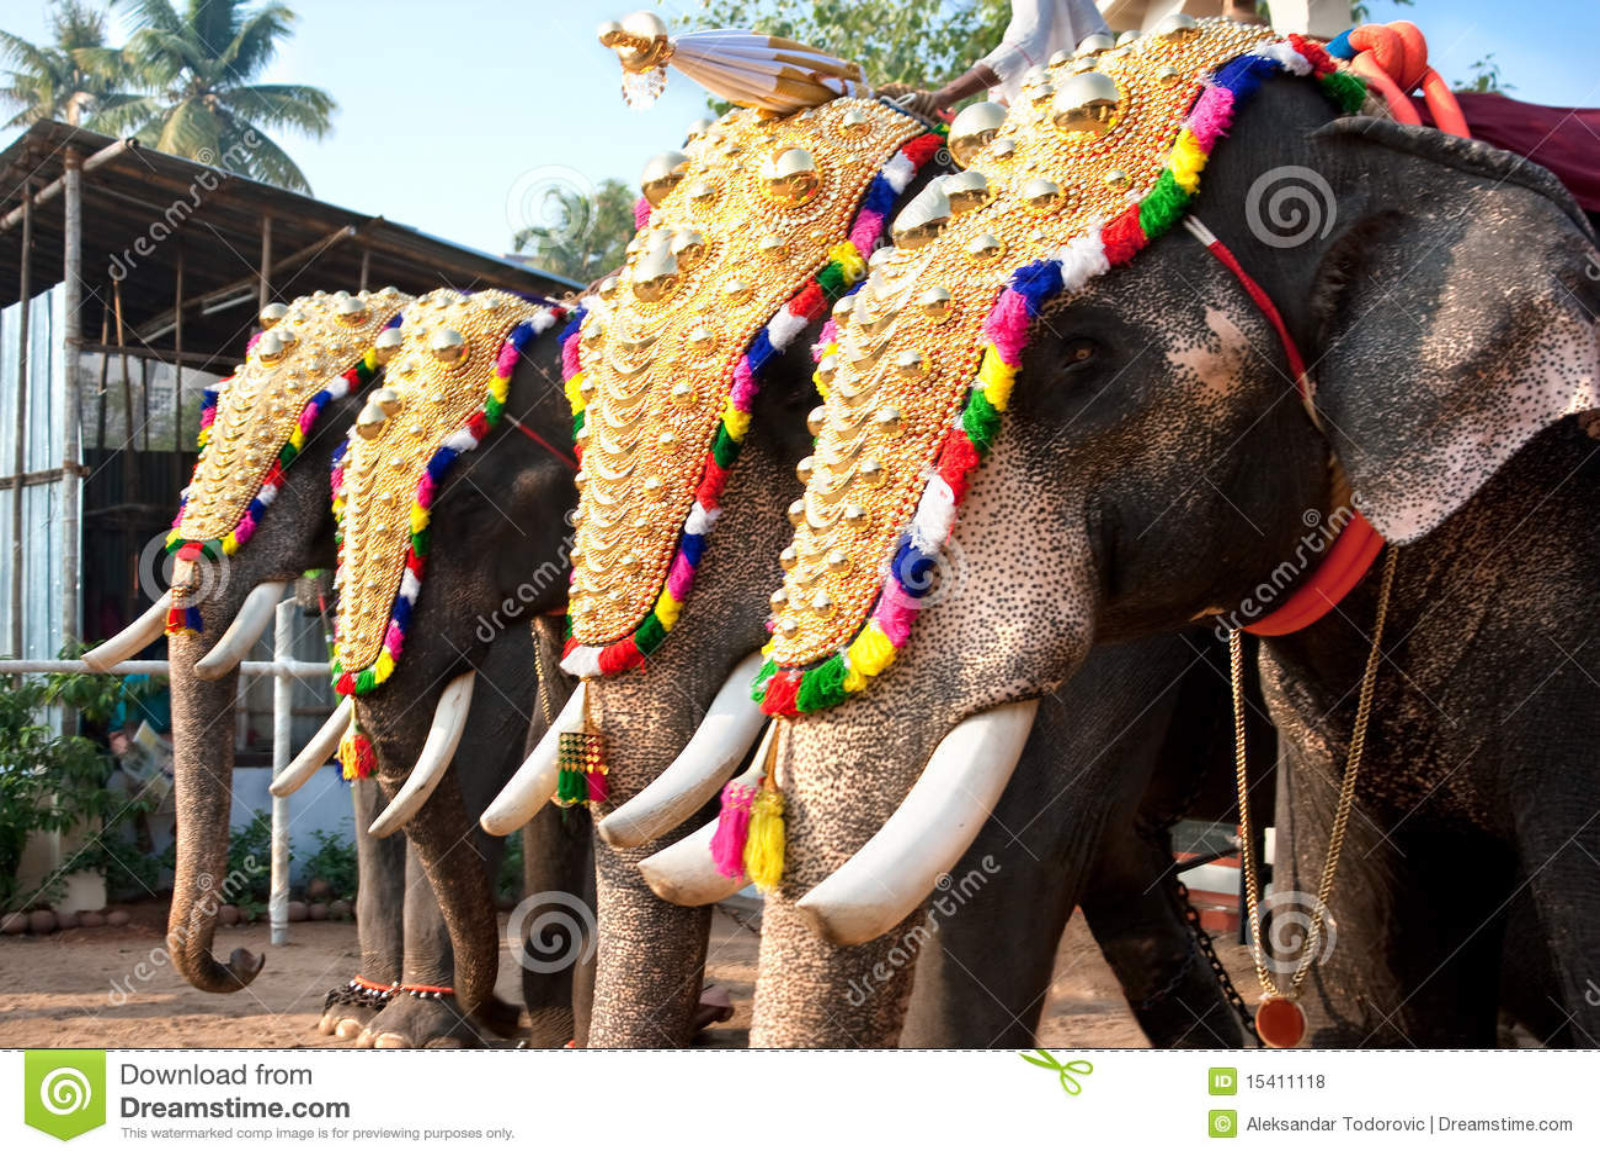 Decorated Elephants For Parade Royalty Free Stock Photos ... - photo#25